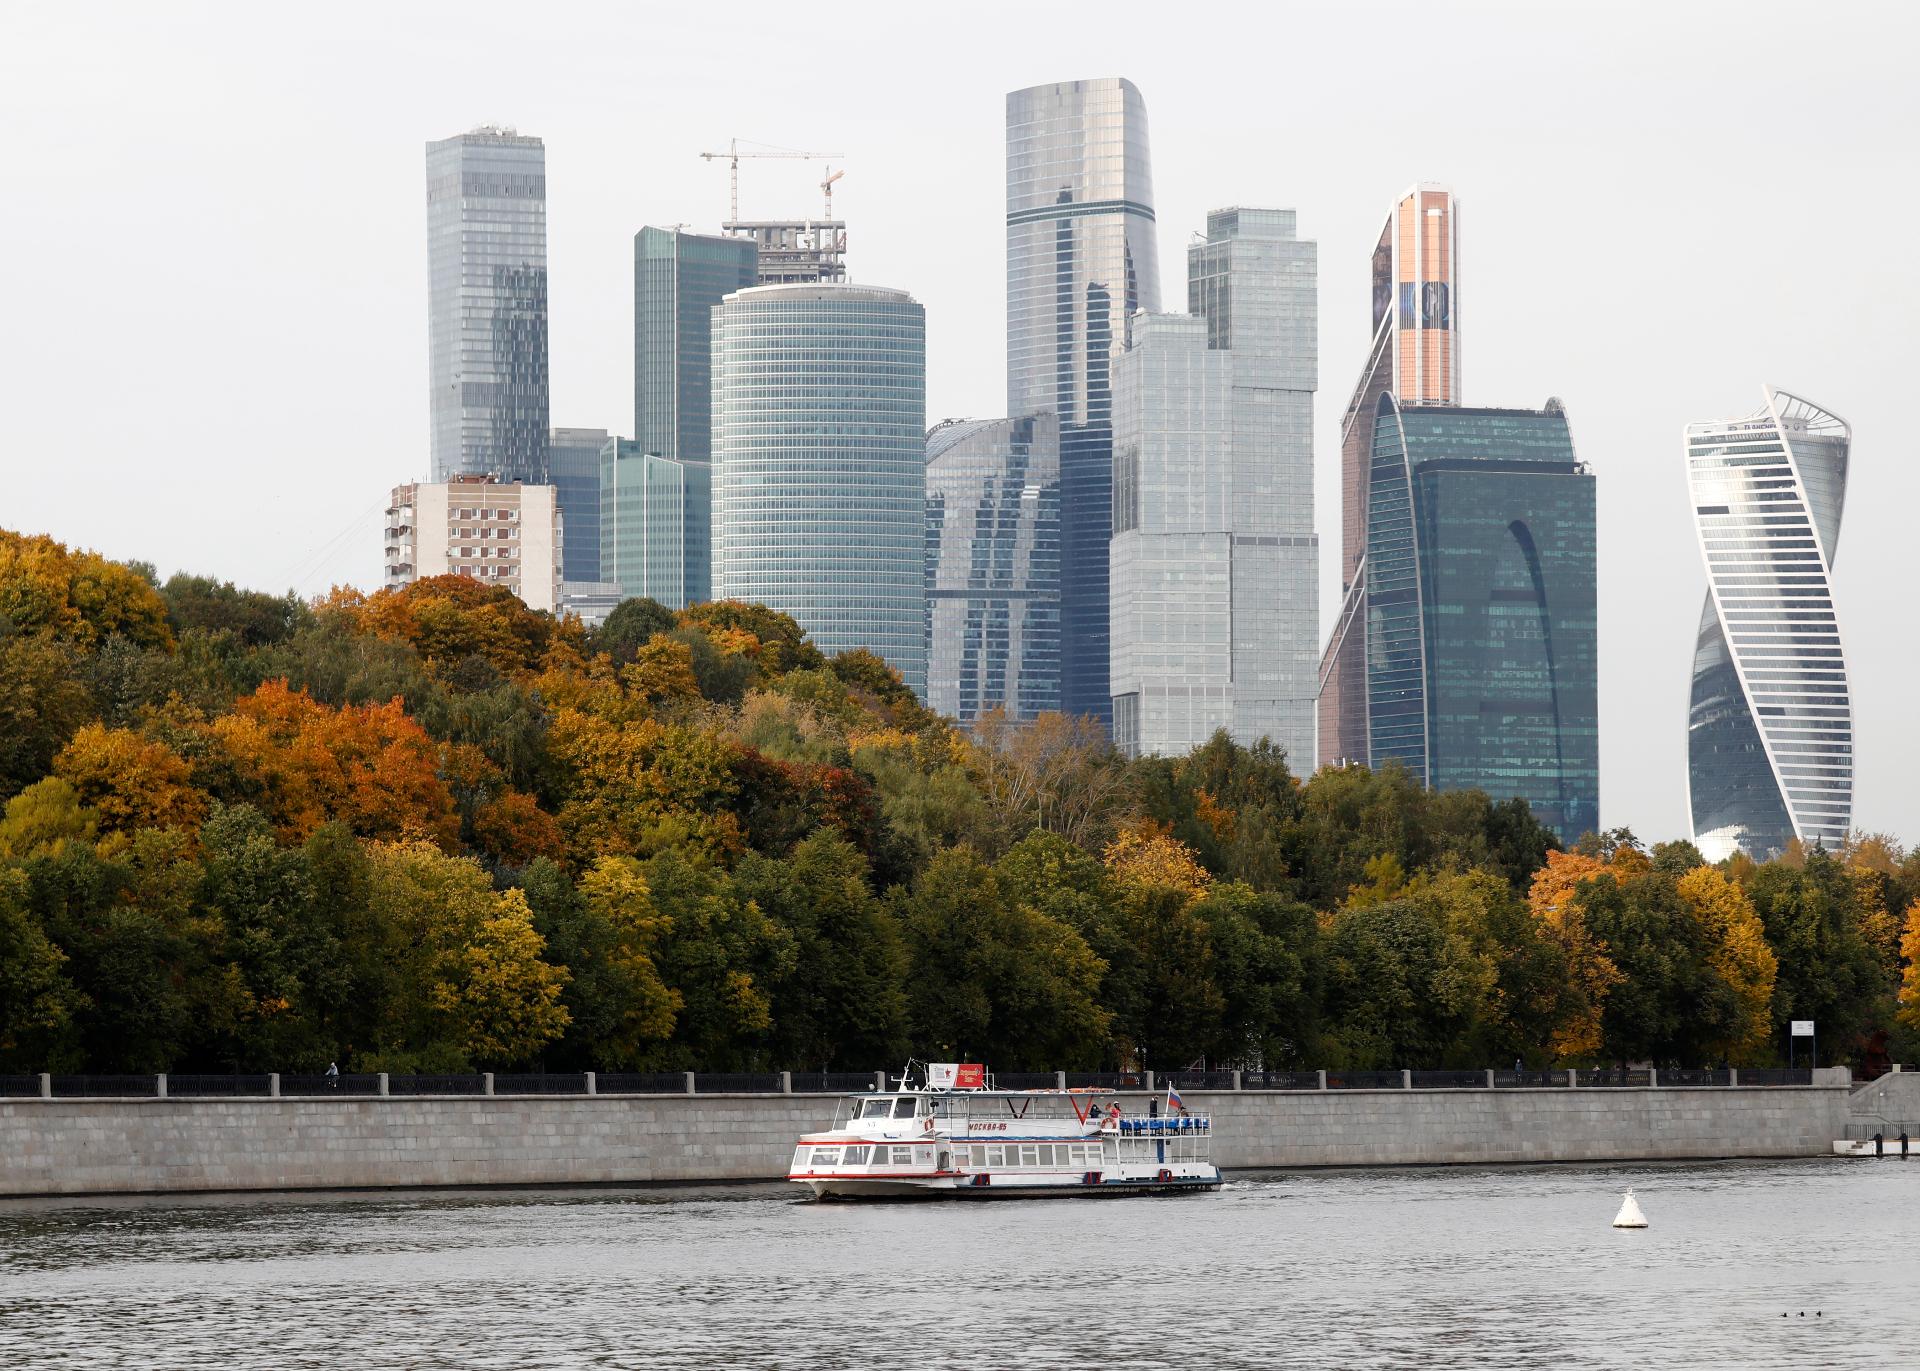 Прогулочный катер на фоне «Москва-Сити»